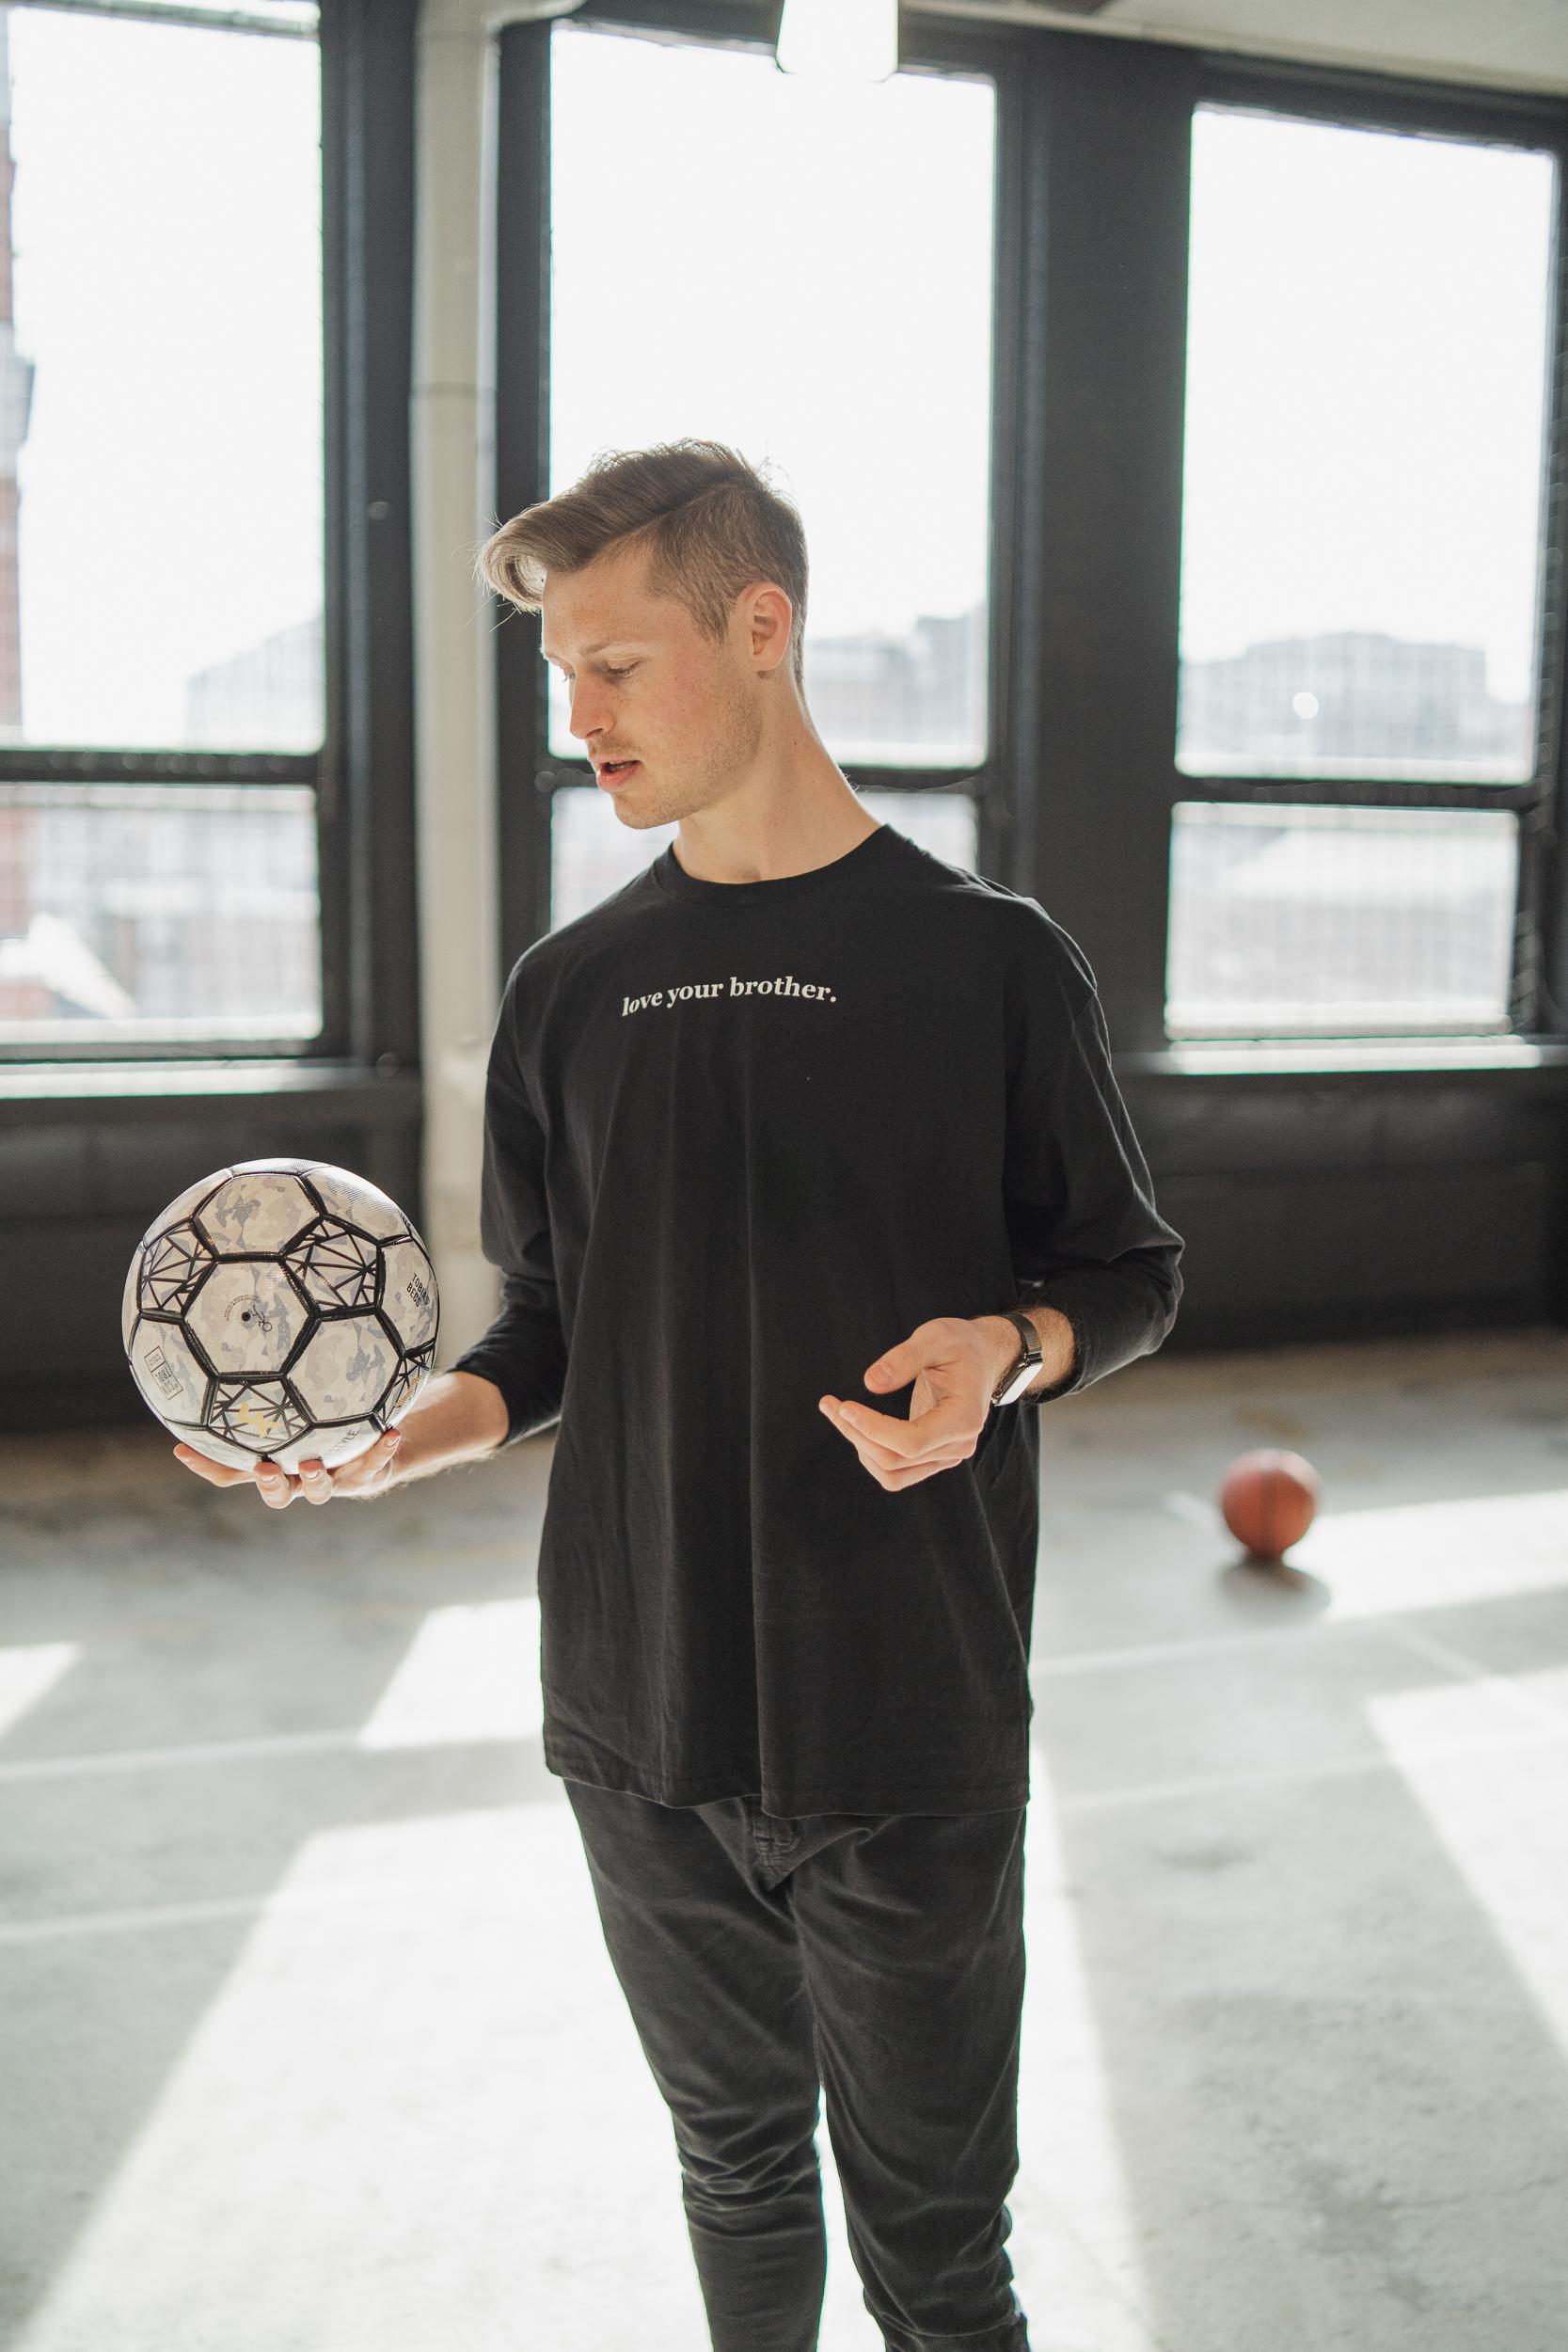 Tobias Becs, Brothers Organization, Brothers, Kim Evensen, freestyle football, einar barane